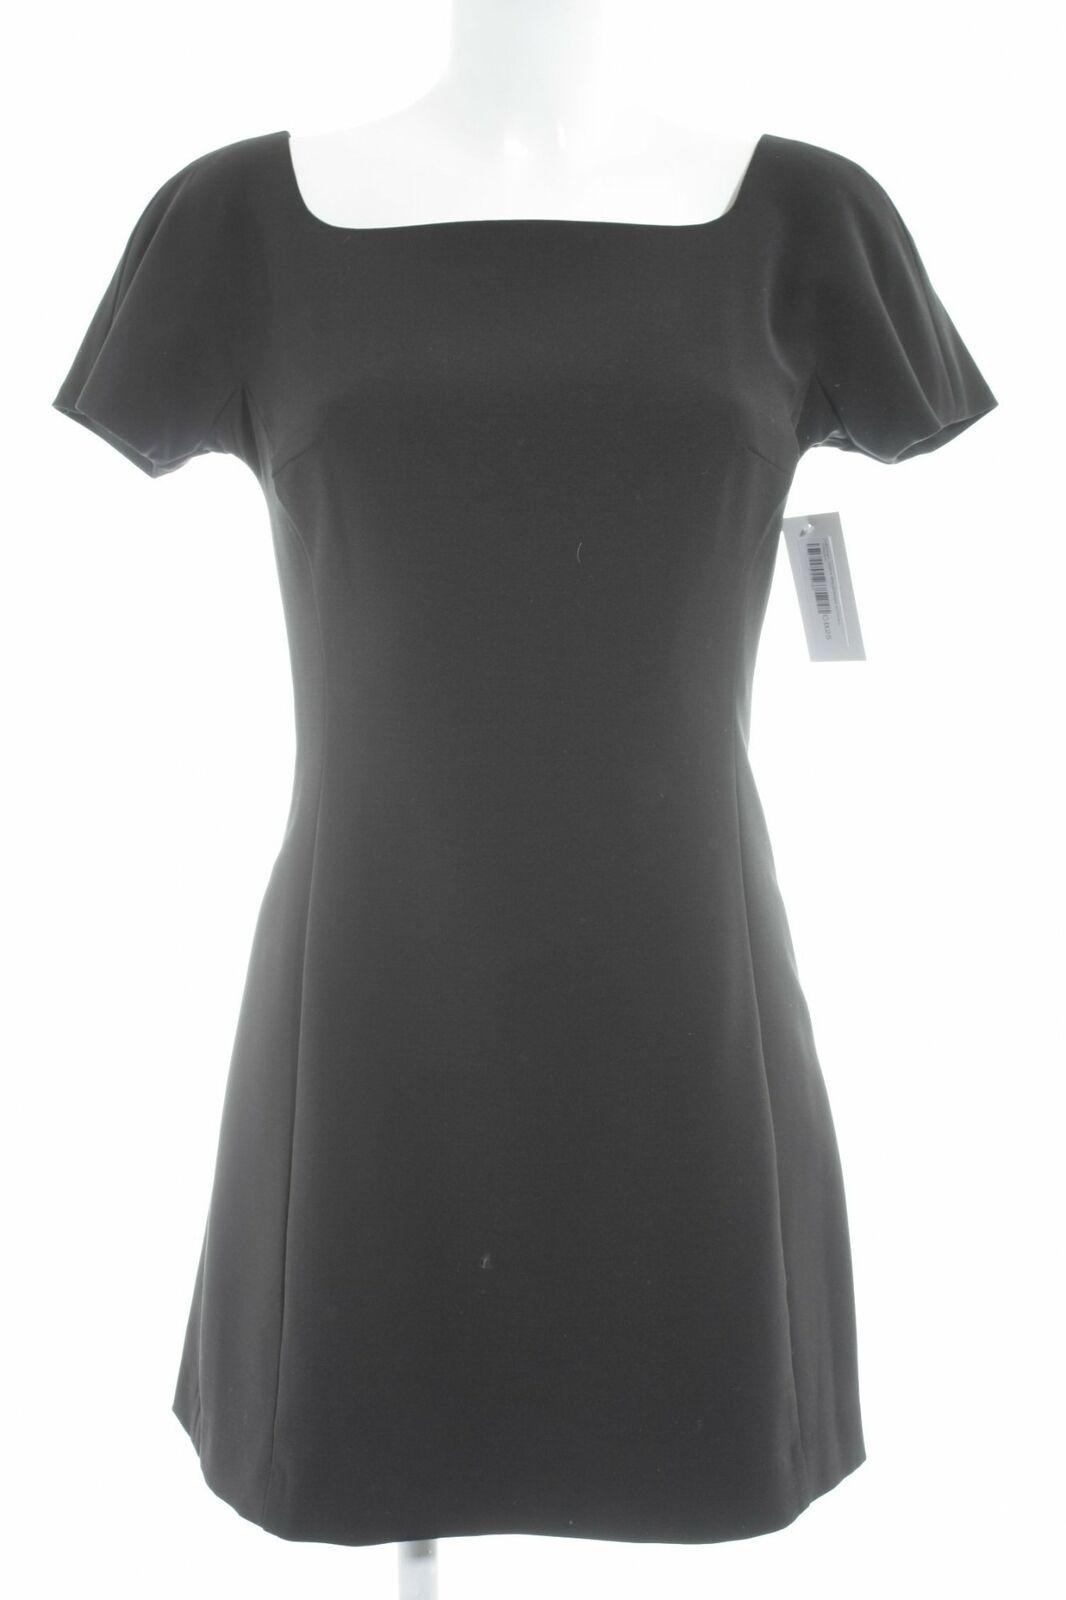 ARMANI JEANS Bleistiftkleid schwarz Elegant Damen Gr. DE 42 Kleid Dress